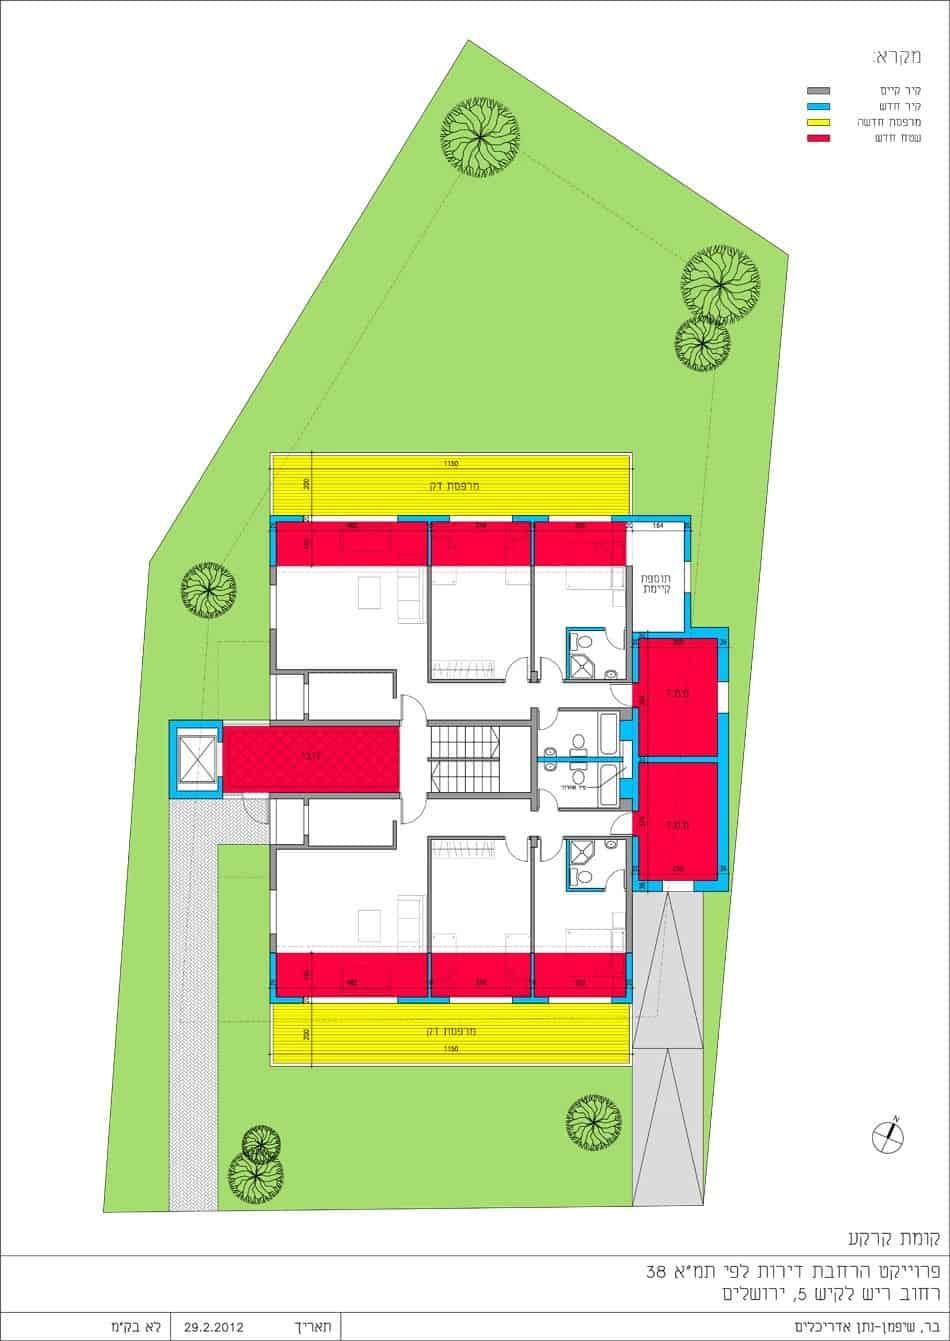 Reish Lakish 5, Jerusalem – Ground floor plan in Tama 38 project